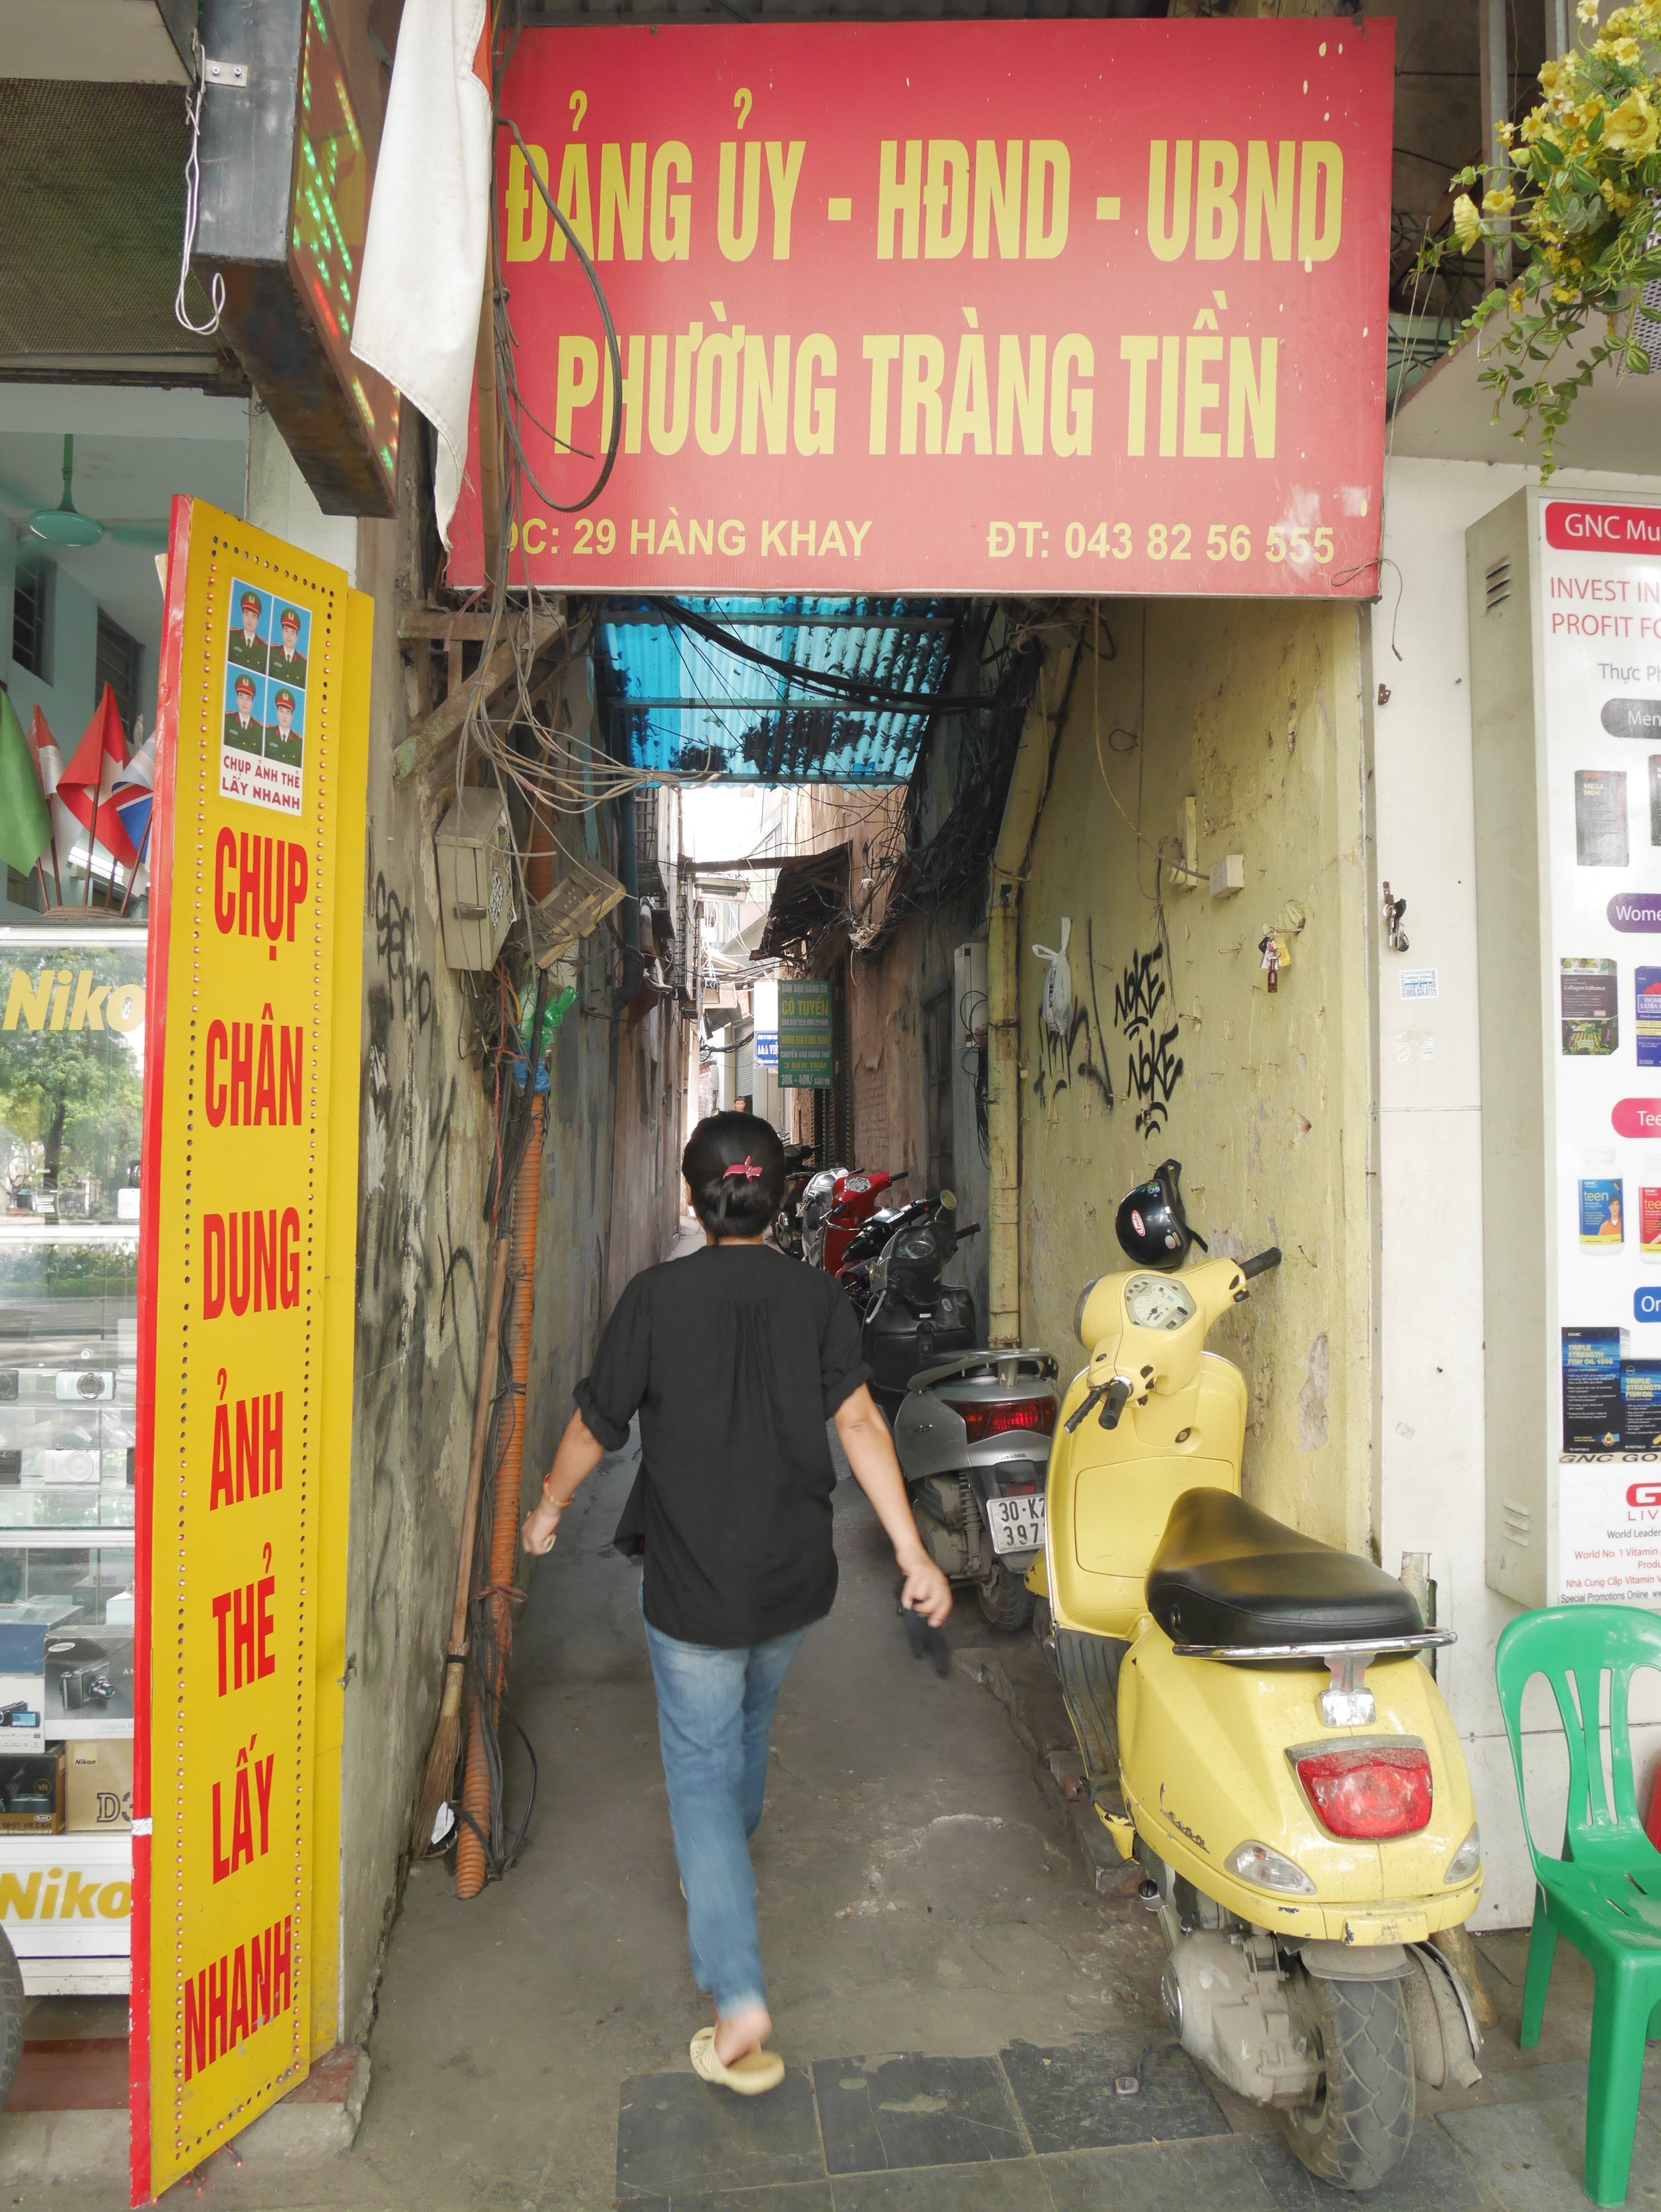 Tiny alley cross Hoan Kiem Lake that hides restaurant inside